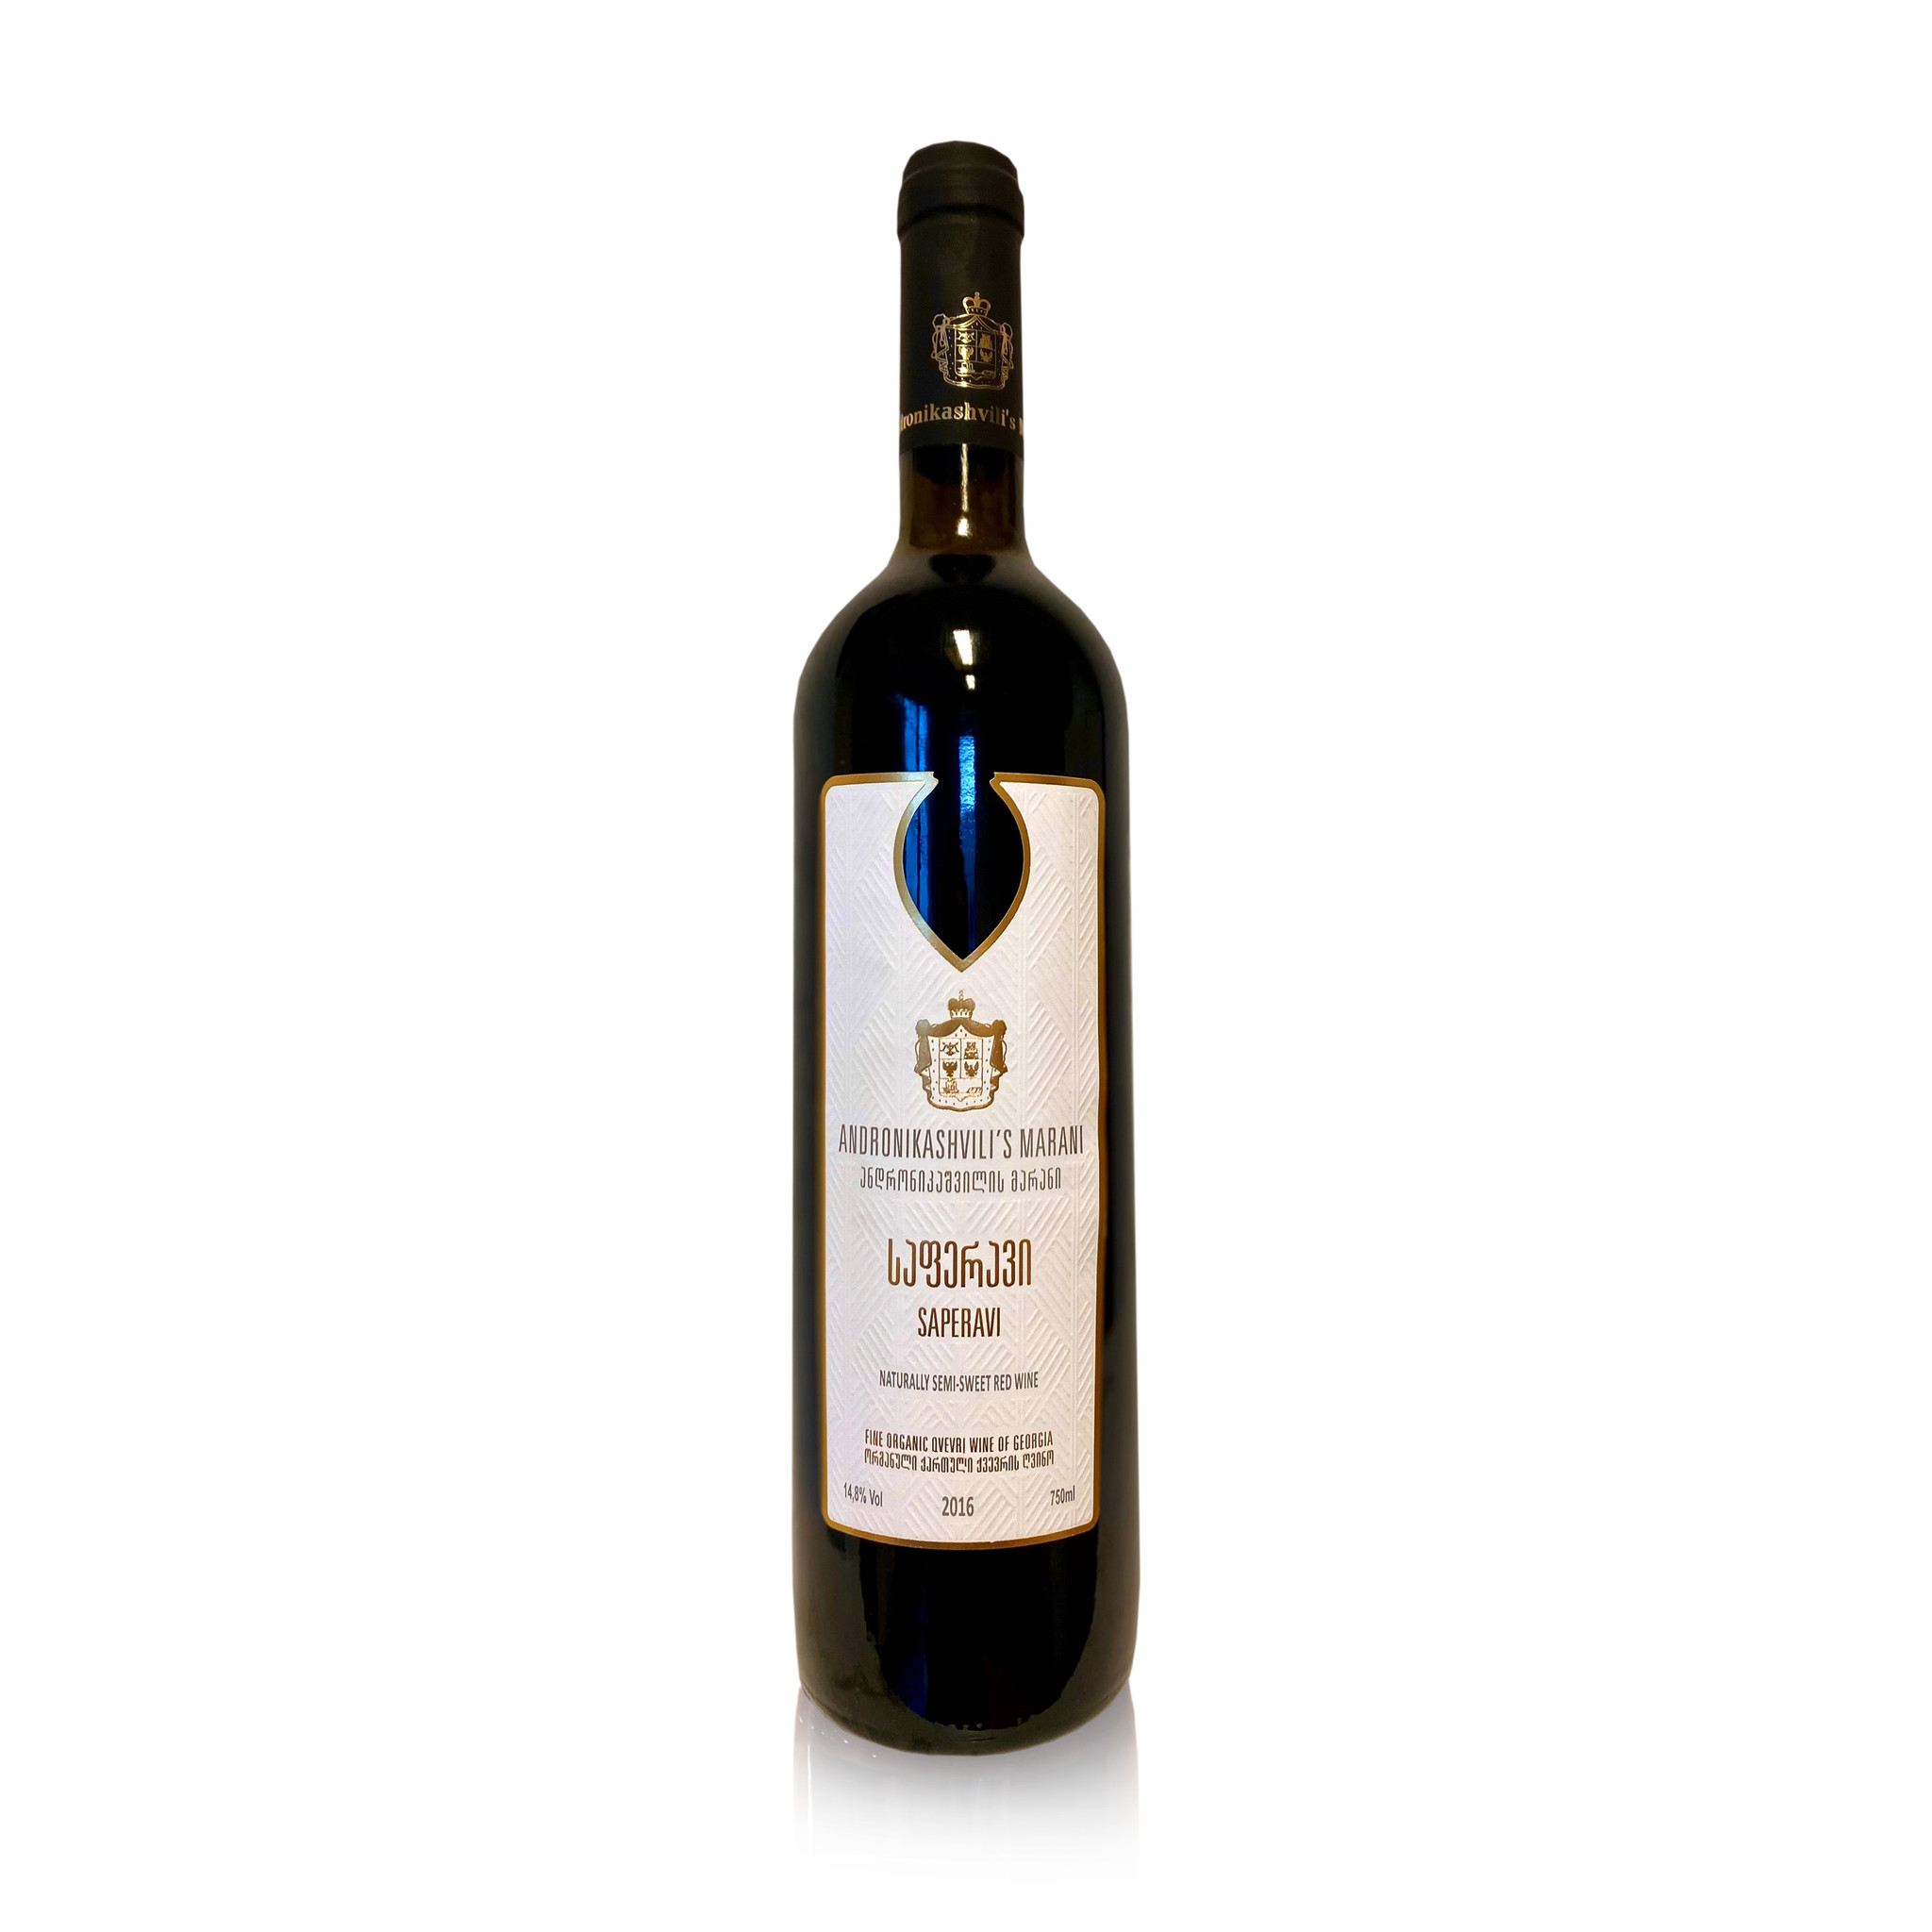 Andronikashvili Bio winery Saperavi [Bio] Halfzoet rode wijn 2016